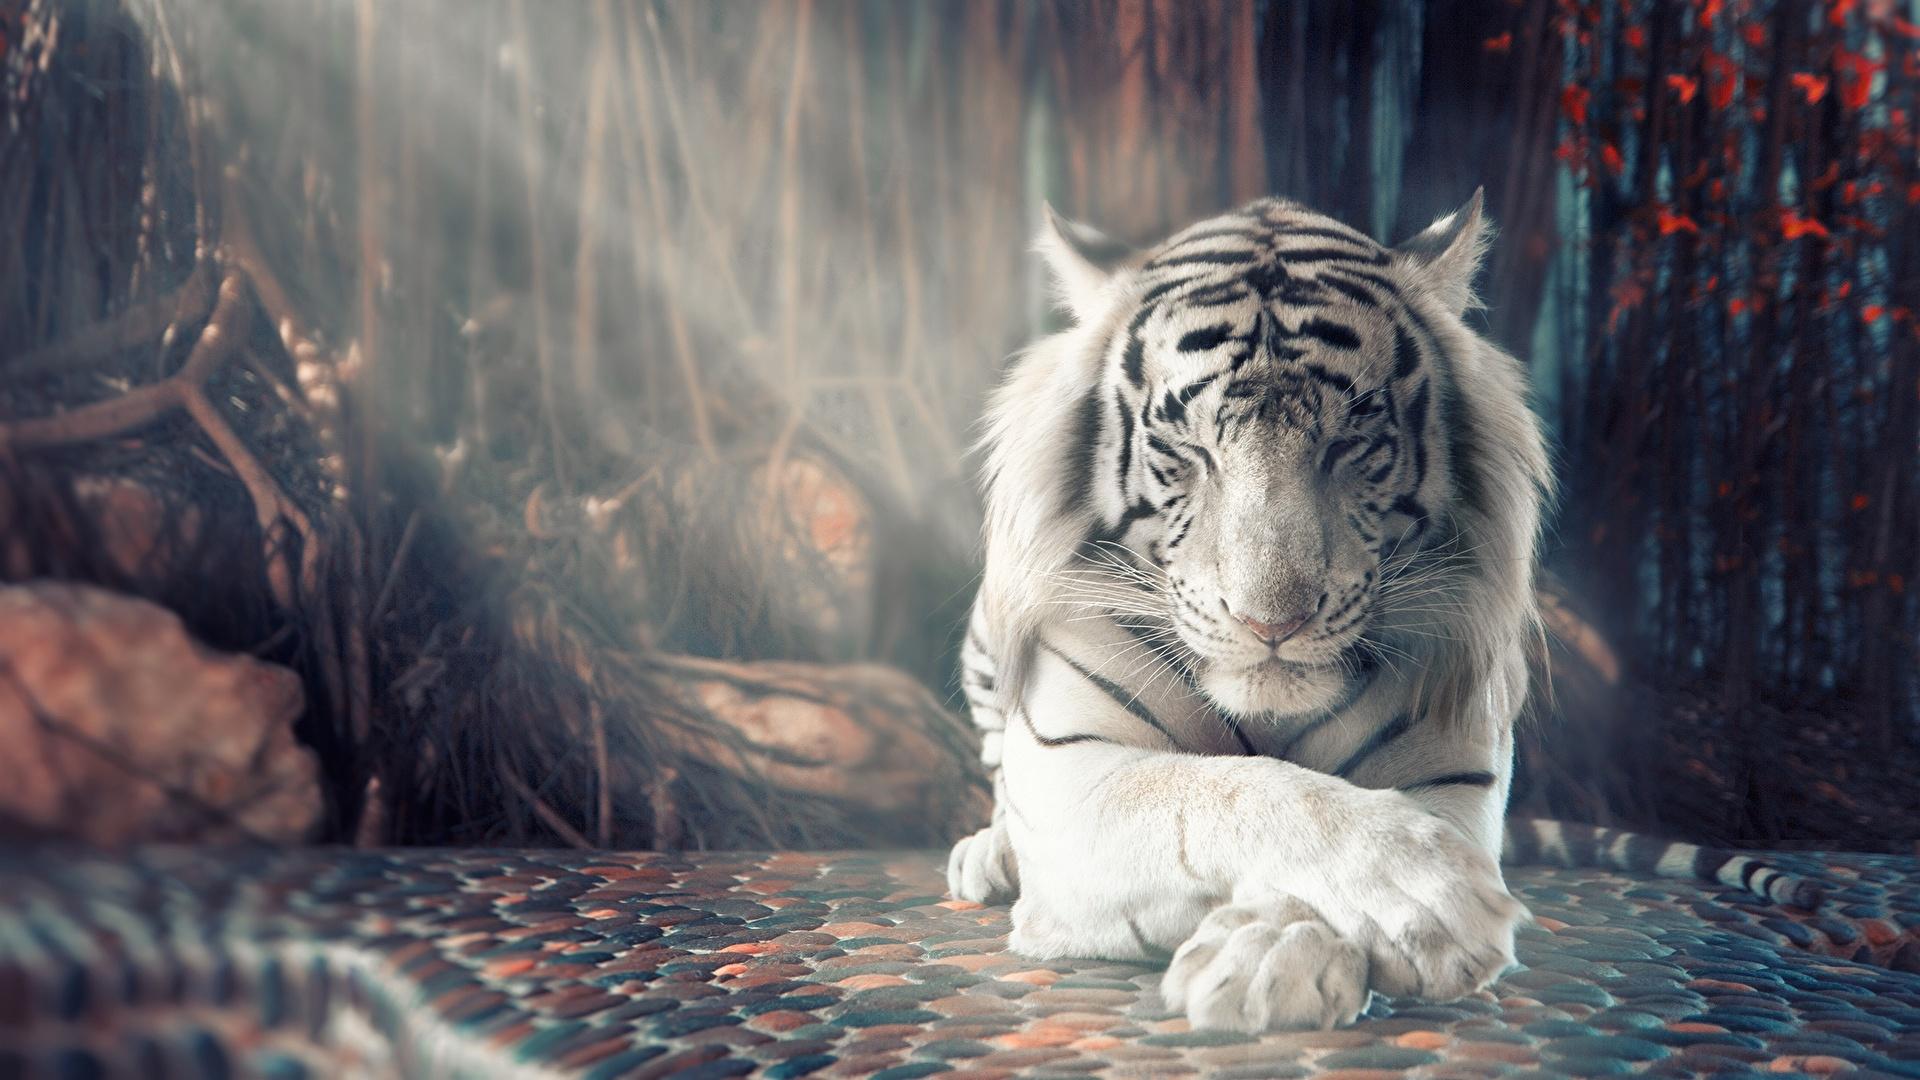 Fonds D Ecran 1920x1080 Tigre Blanc Patte Animaux Telecharger Photo